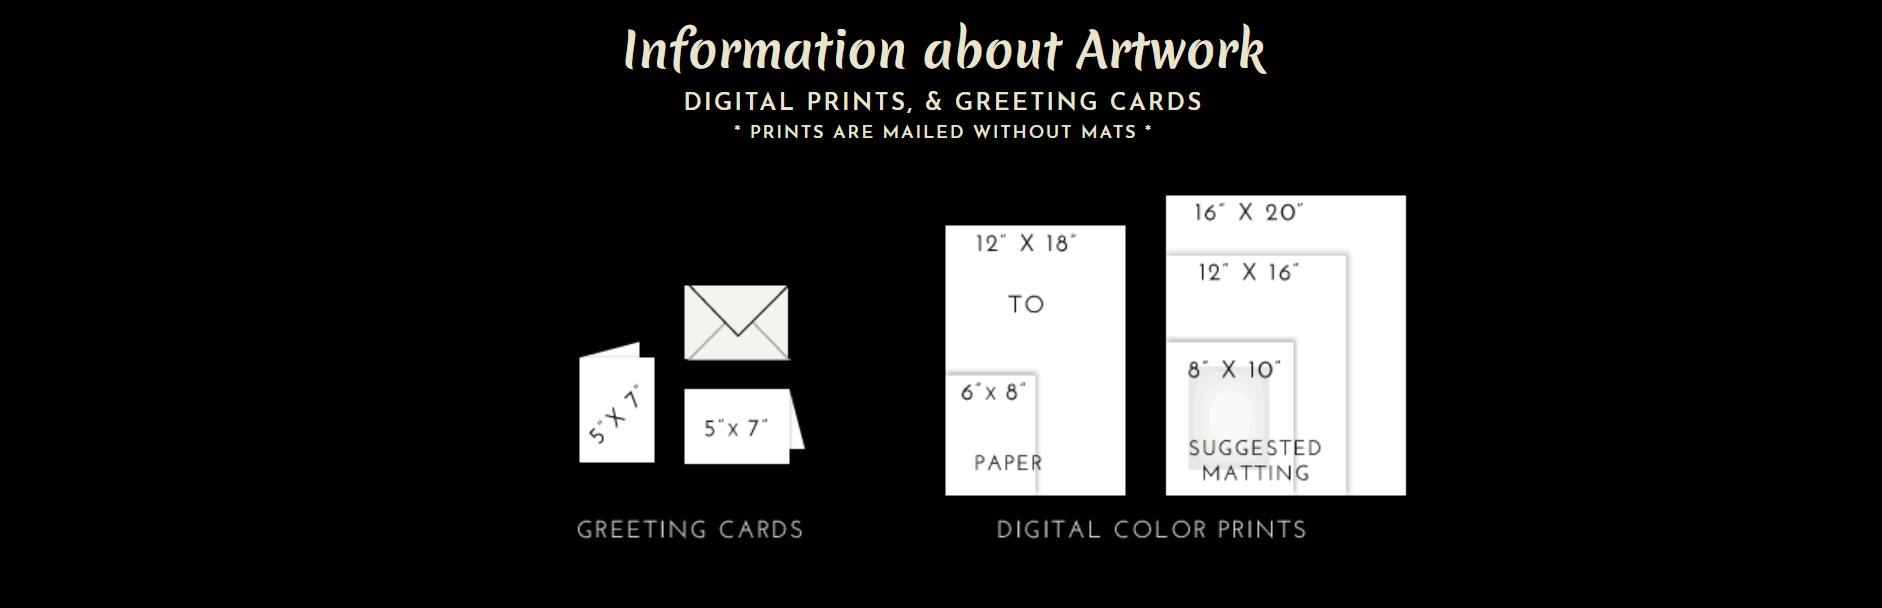 ArtWork Info.jpg